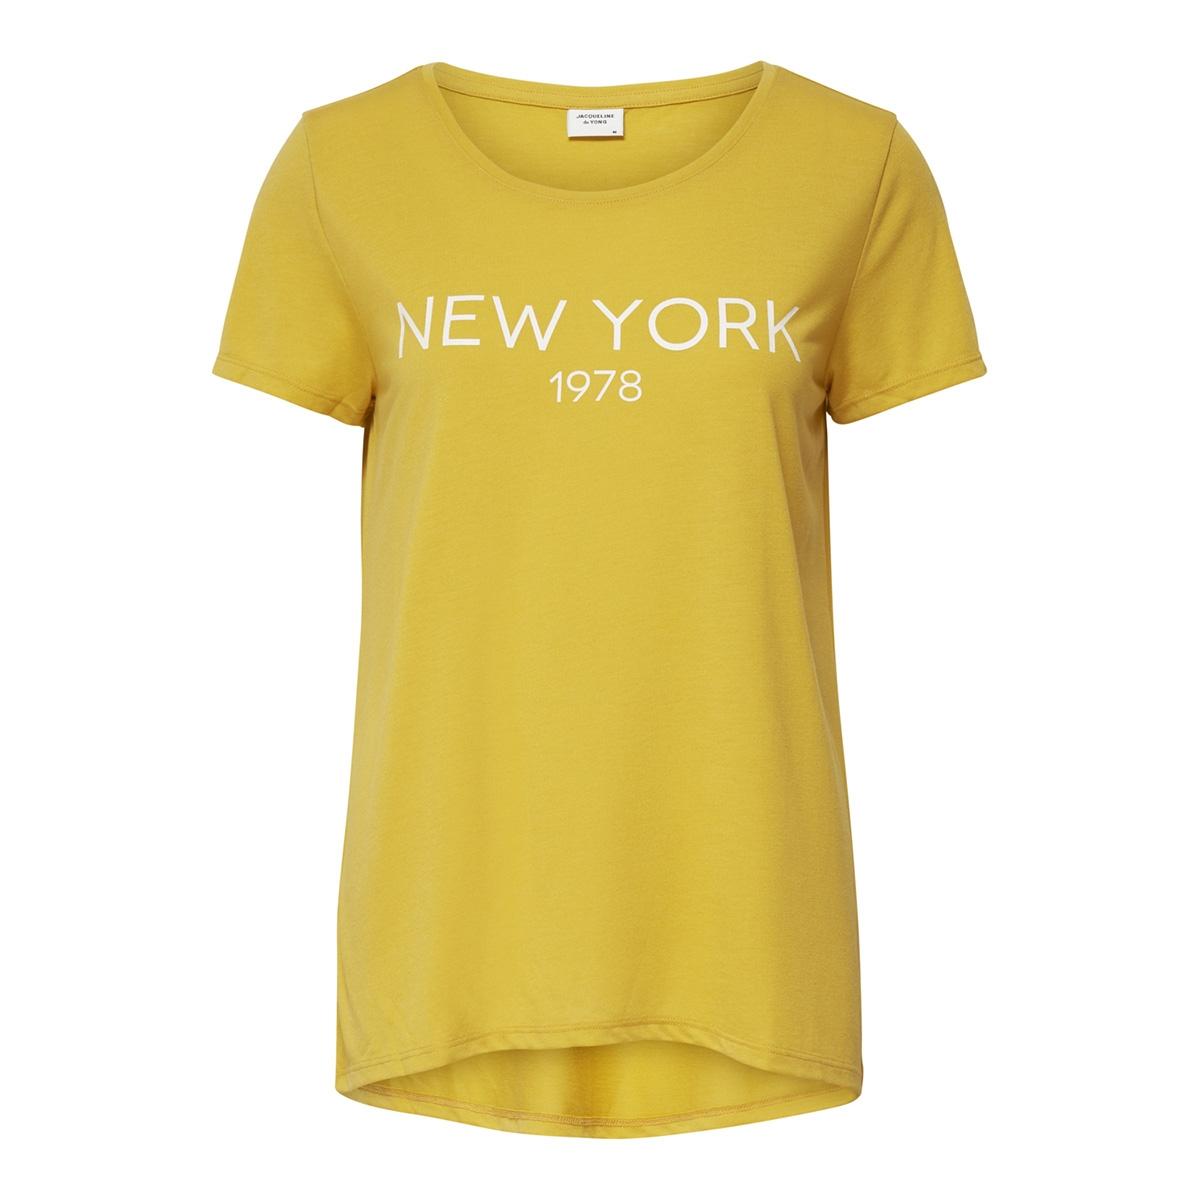 jdycity icon print s/s top jrs 15175243 jacqueline de yong t-shirt spicy mustard/new york 1